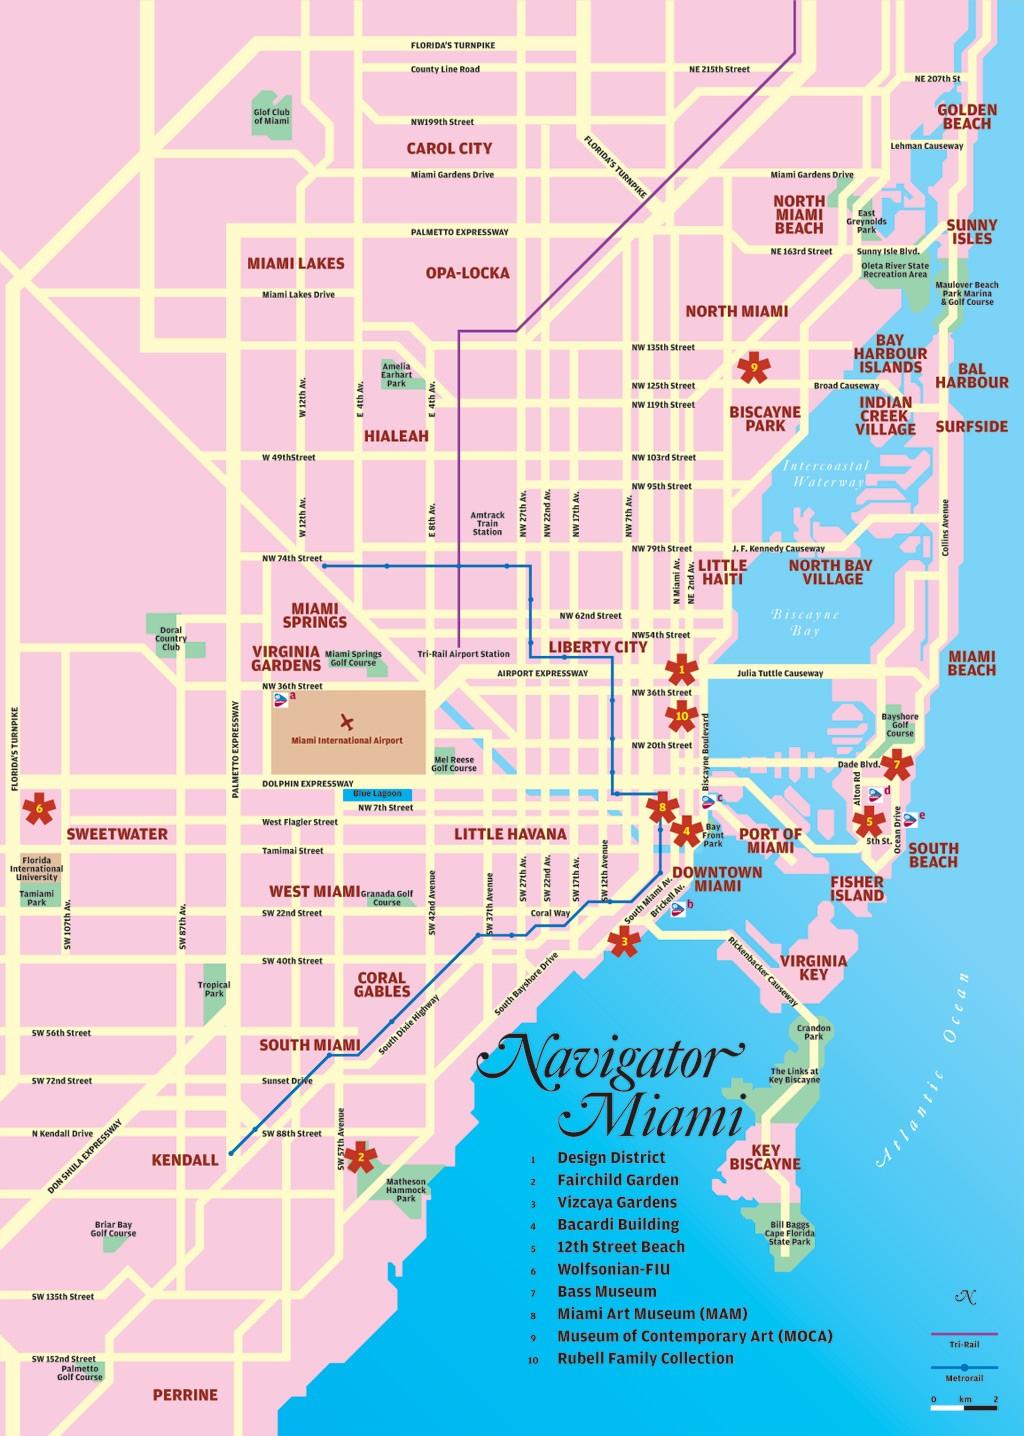 Miami Tourist Map - Miami Florida • Mappery - Florida Travel Guide Map